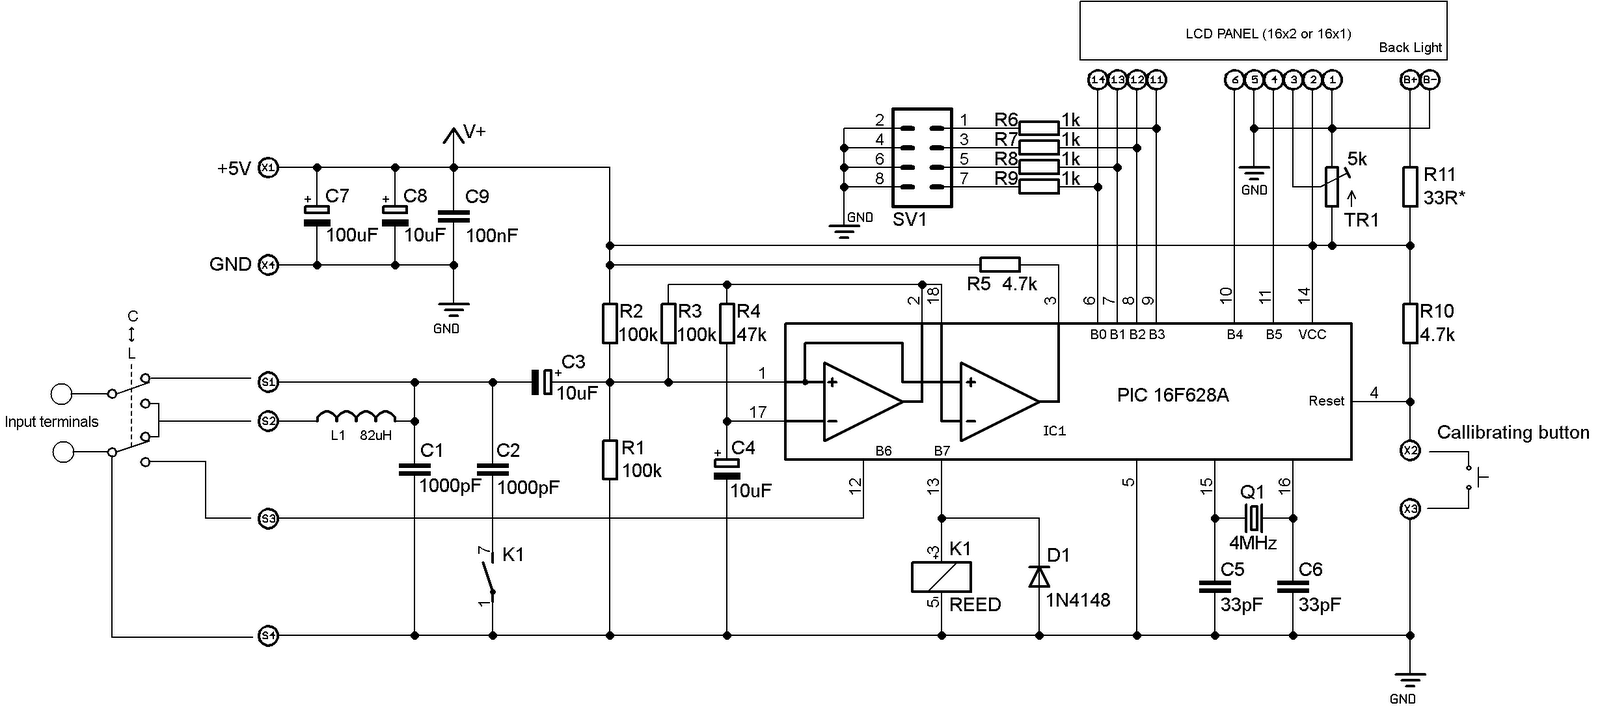 inductance meter schematic linear inductance meter circuit schematic circuitdiagram measuringandtestcircuit linearinductancemeter [ 1600 x 714 Pixel ]